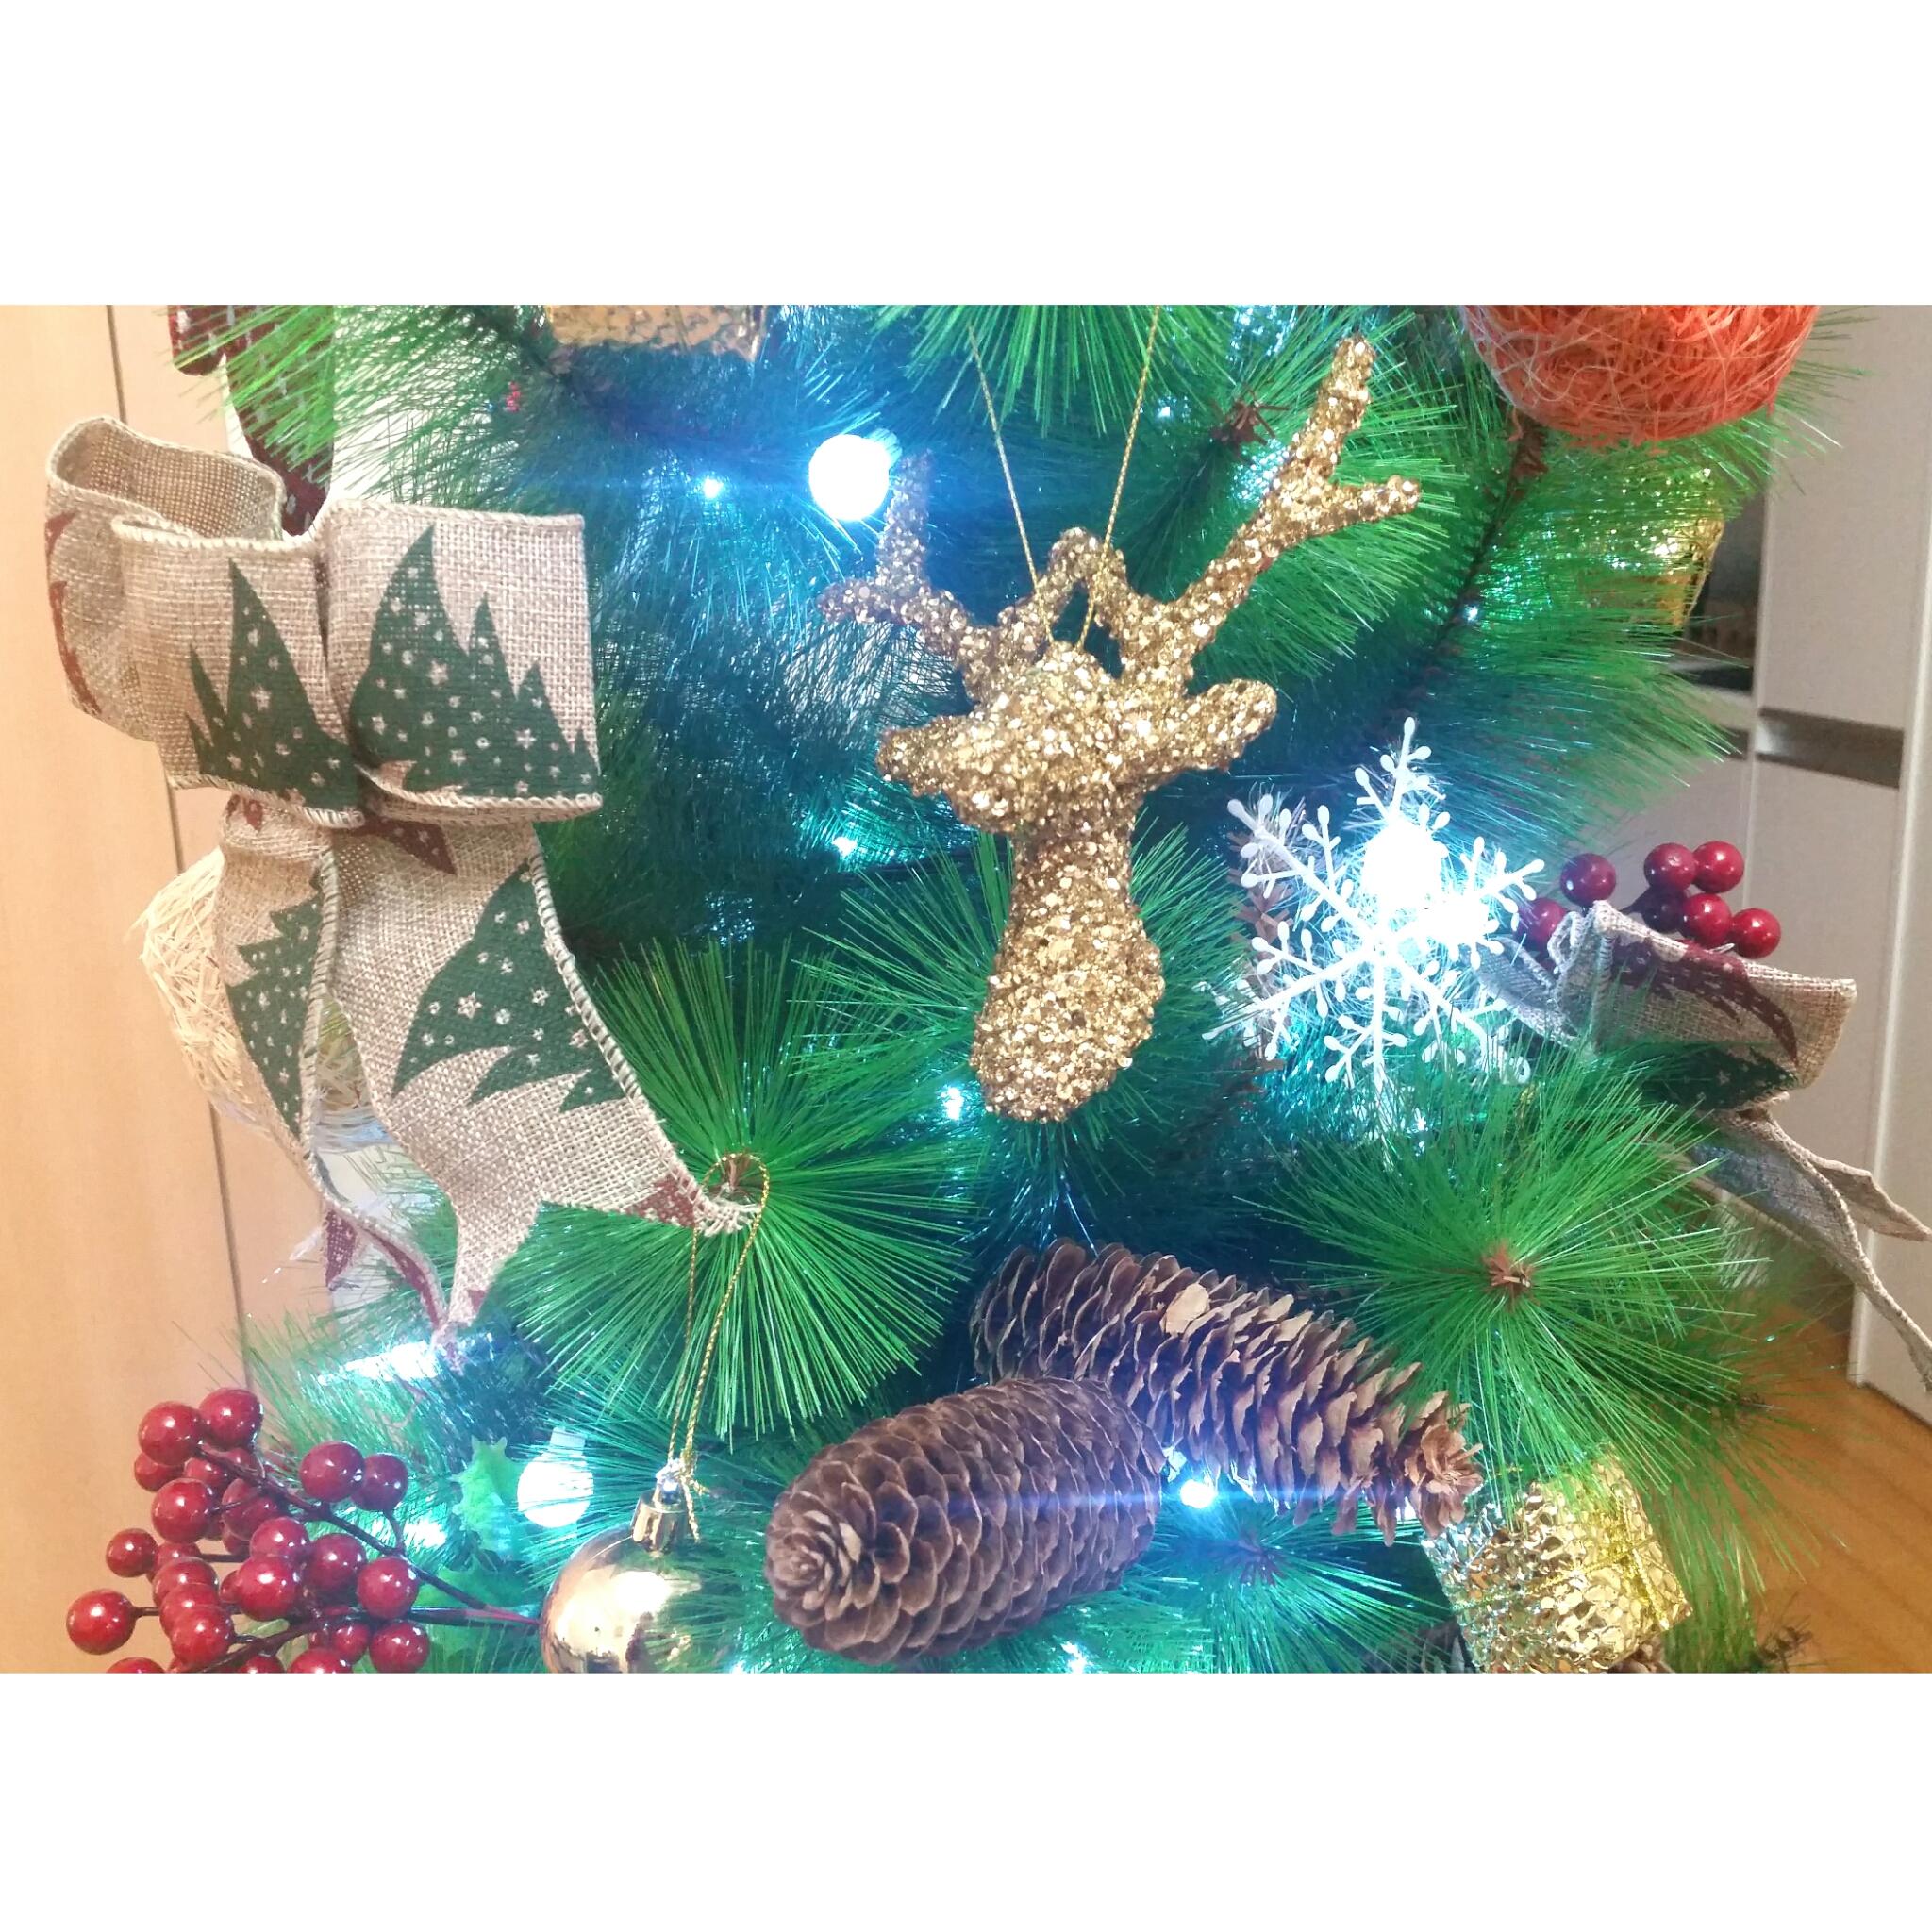 [Blogmas] Day 3: Christmas Decorating On A Budget